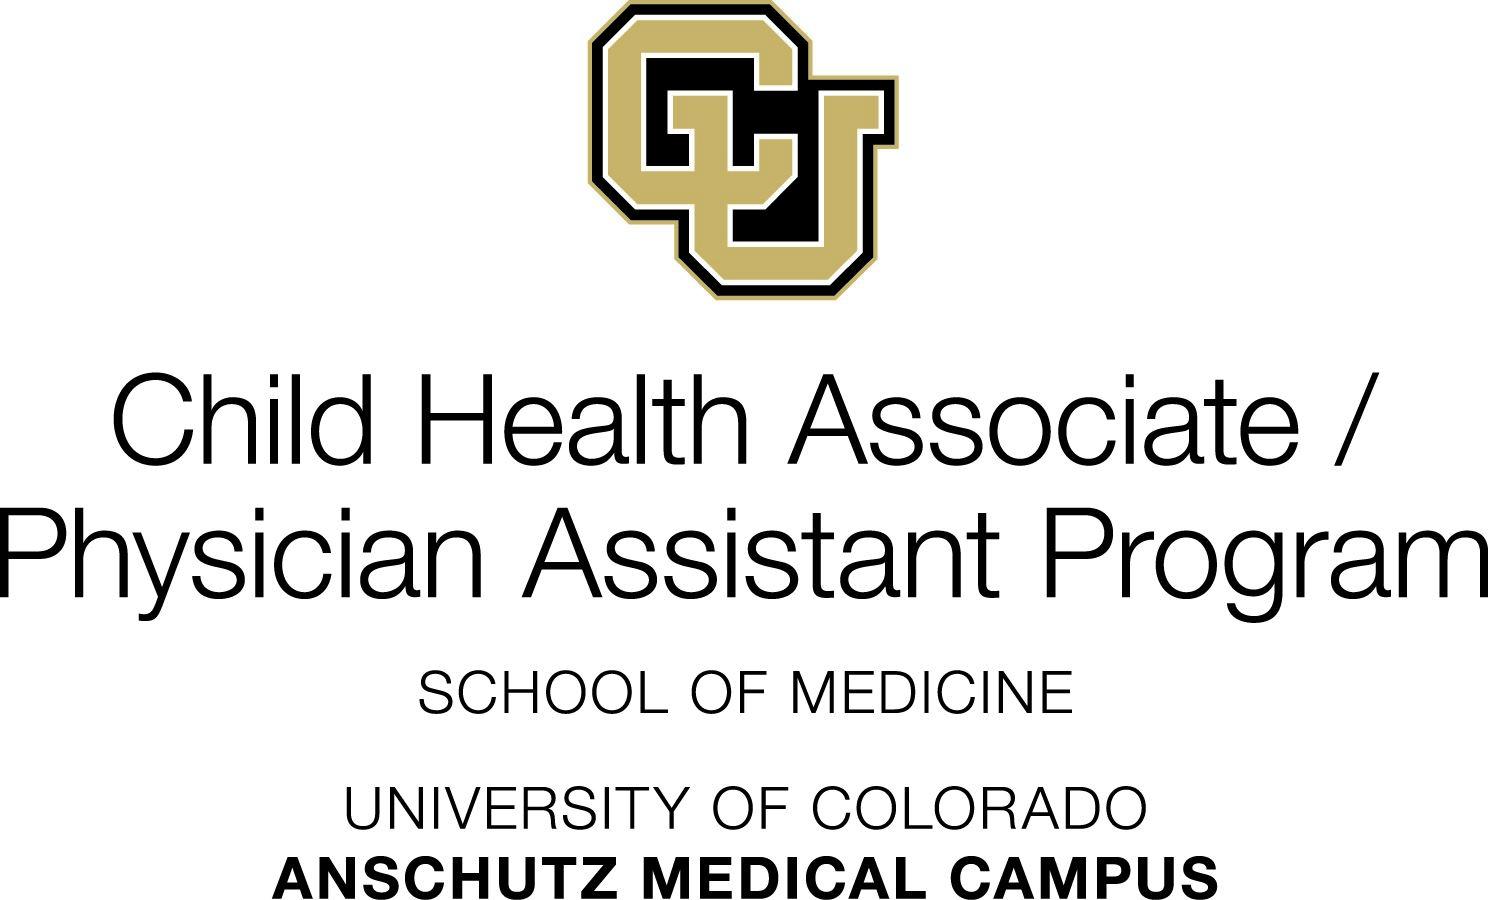 University of Colorado Child Health Associate/Physician Assistant Program